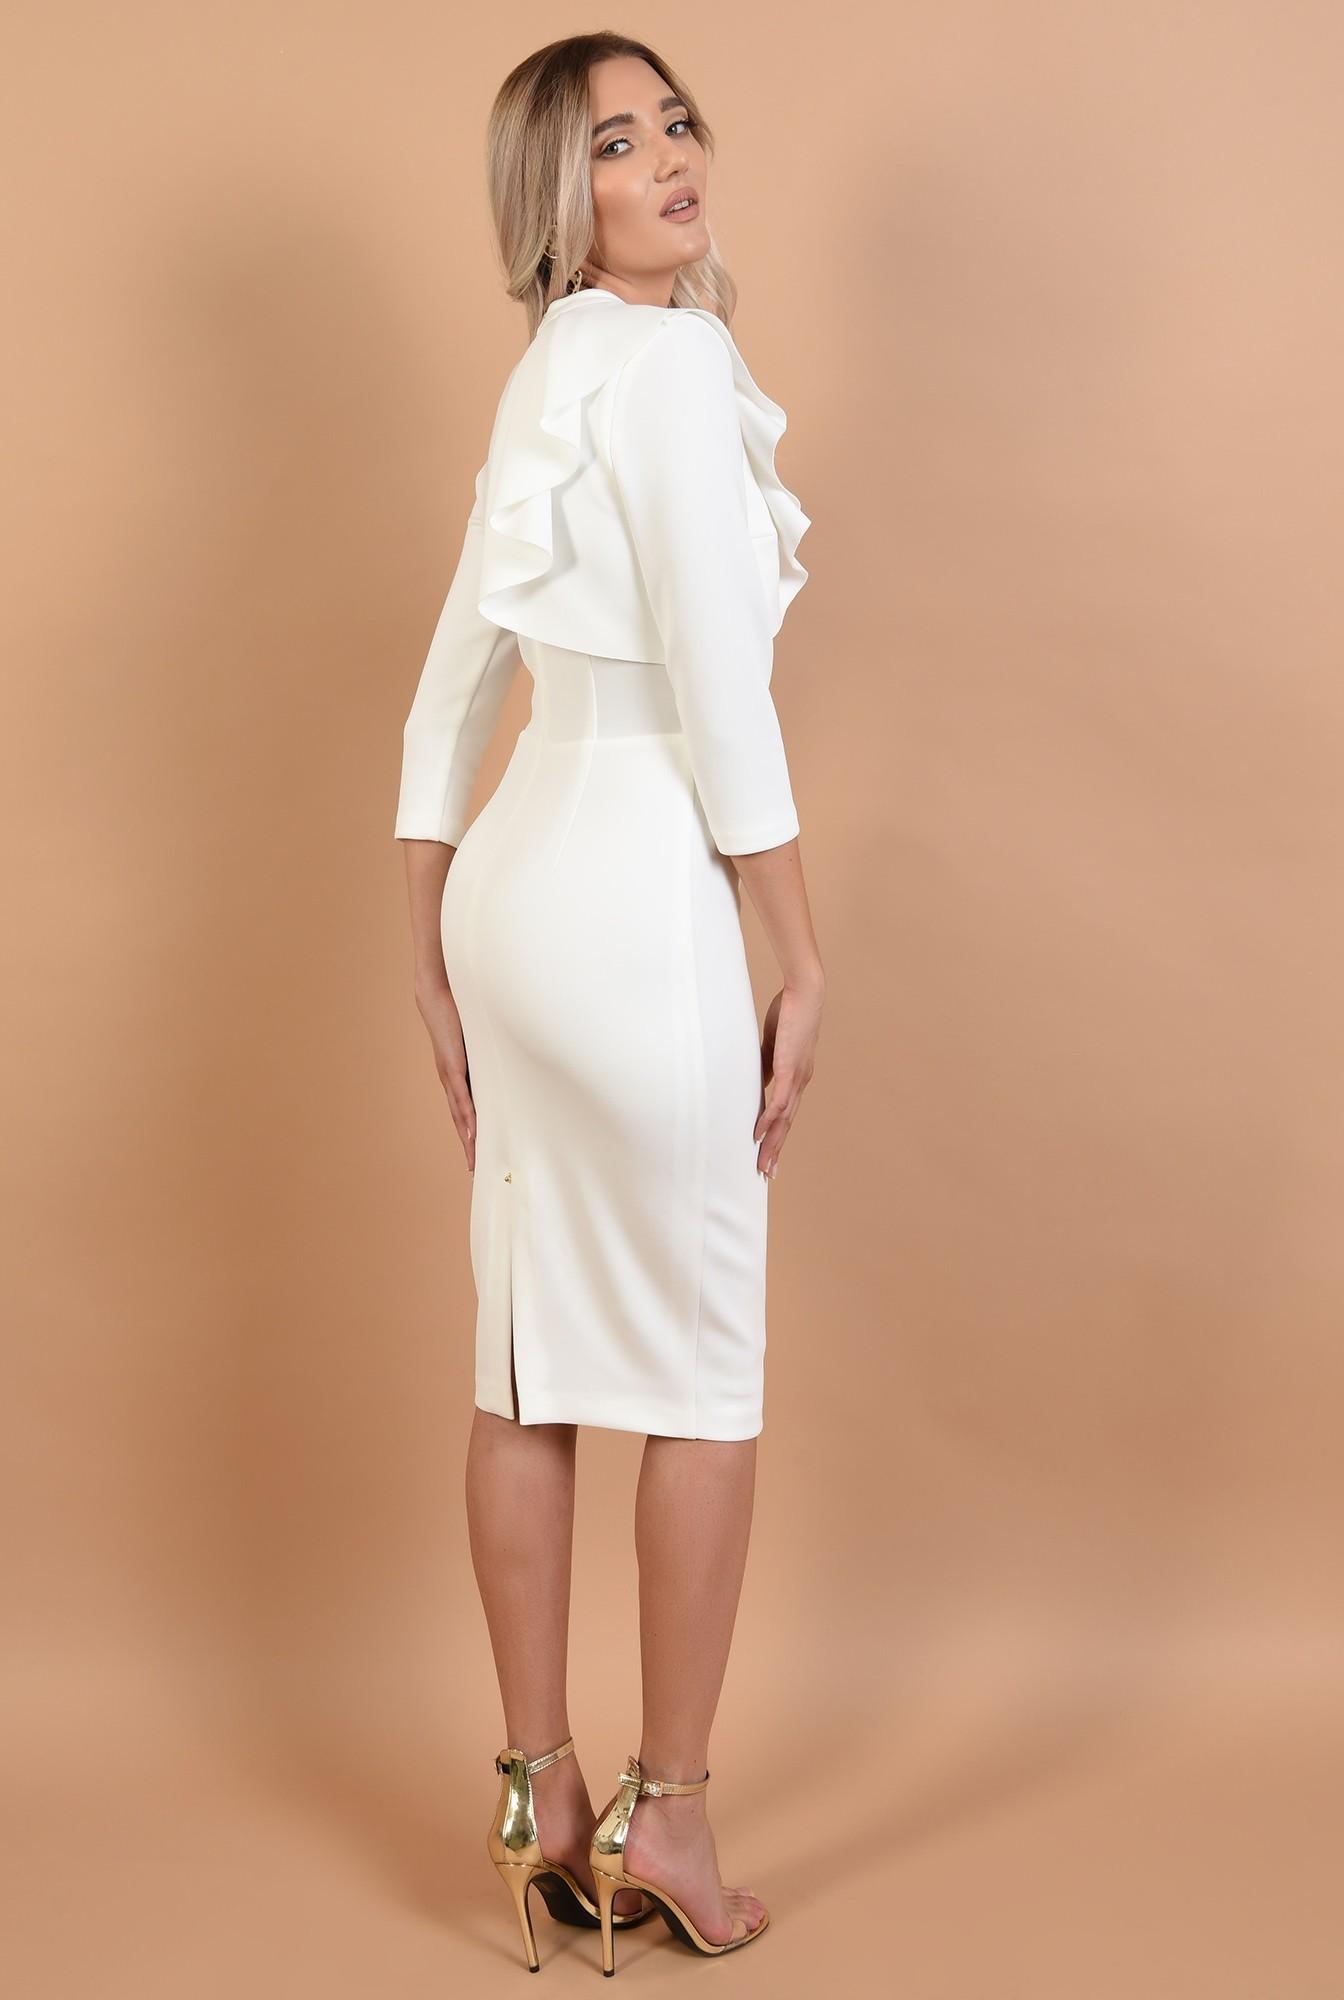 1 - 360 - rochie conica, alba, midi, aplicatie cu pliuri, guler inalt, Poema